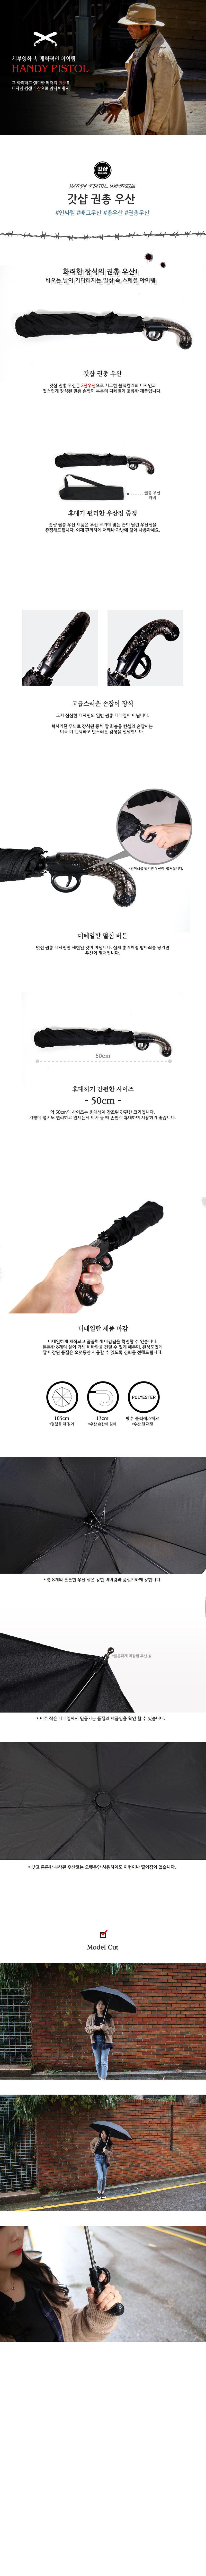 SNS인싸템 갓샵 권총우산 접이식 2단 자동 총모양디자인 엄브렐라 - 갓샵, 19,900원, 우산, 자동3단/5단우산